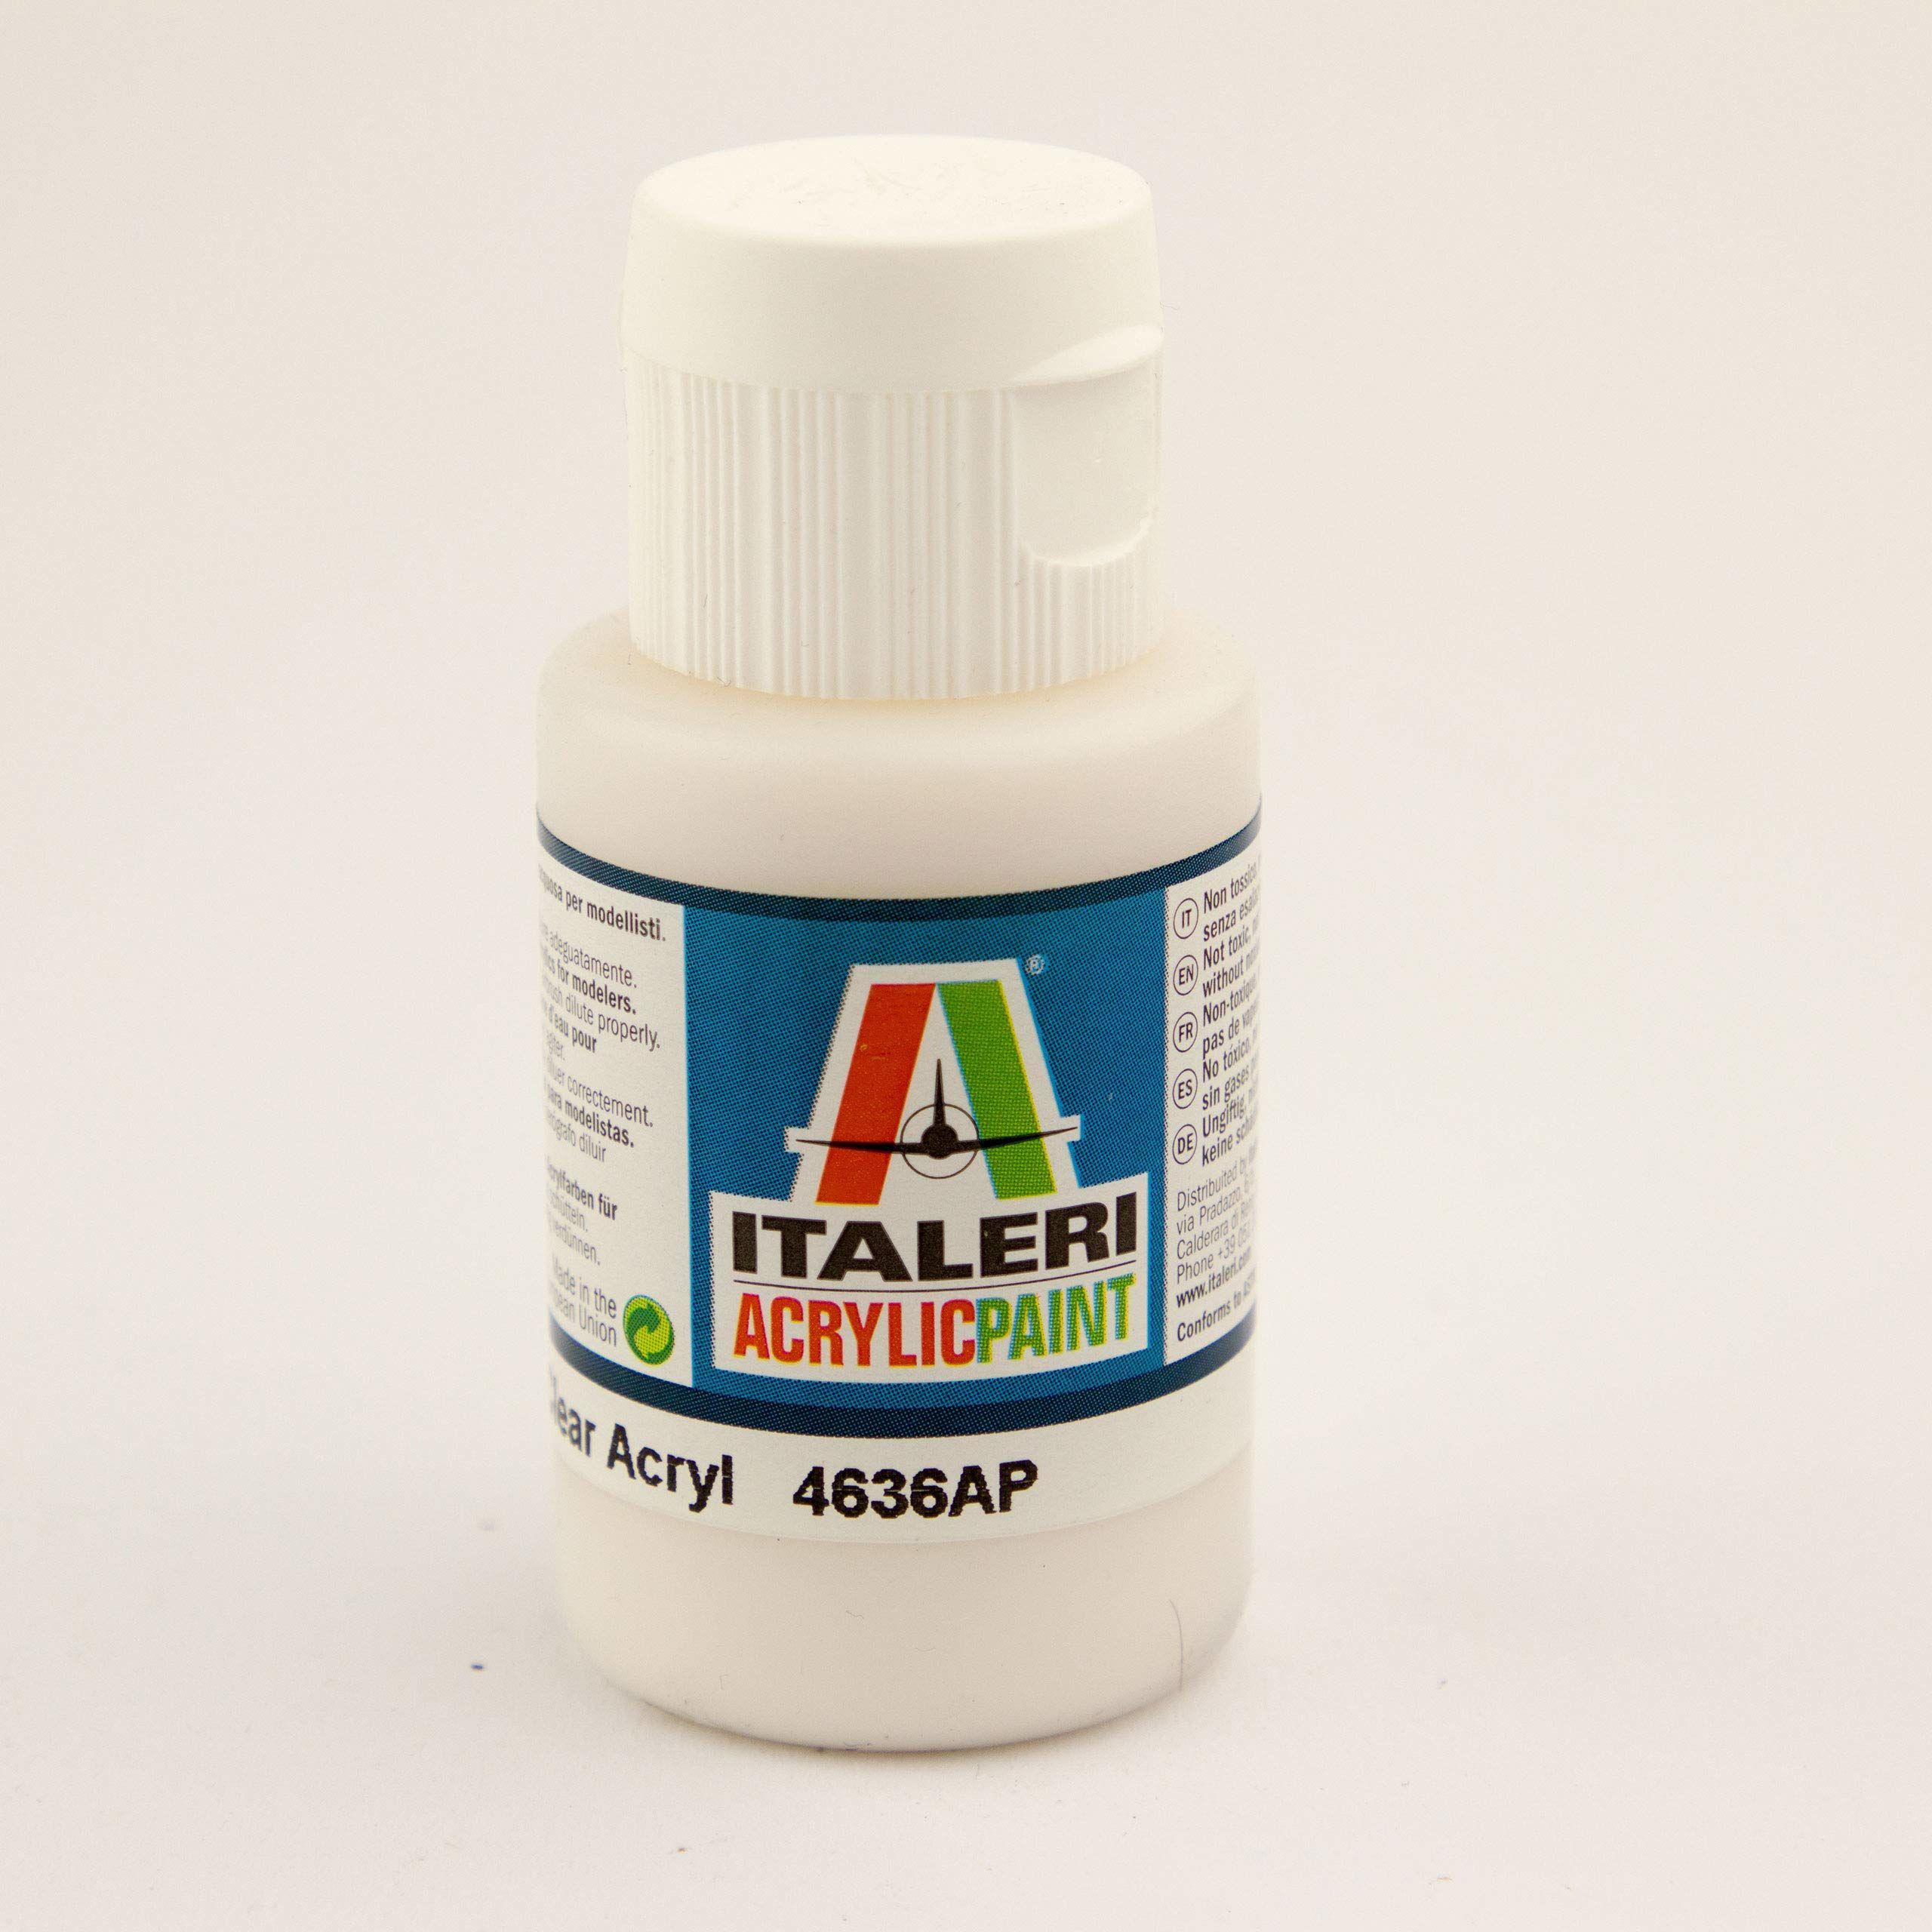 Italeri IT4636AP Acrylic Paint Transparent Mat, 35 ml